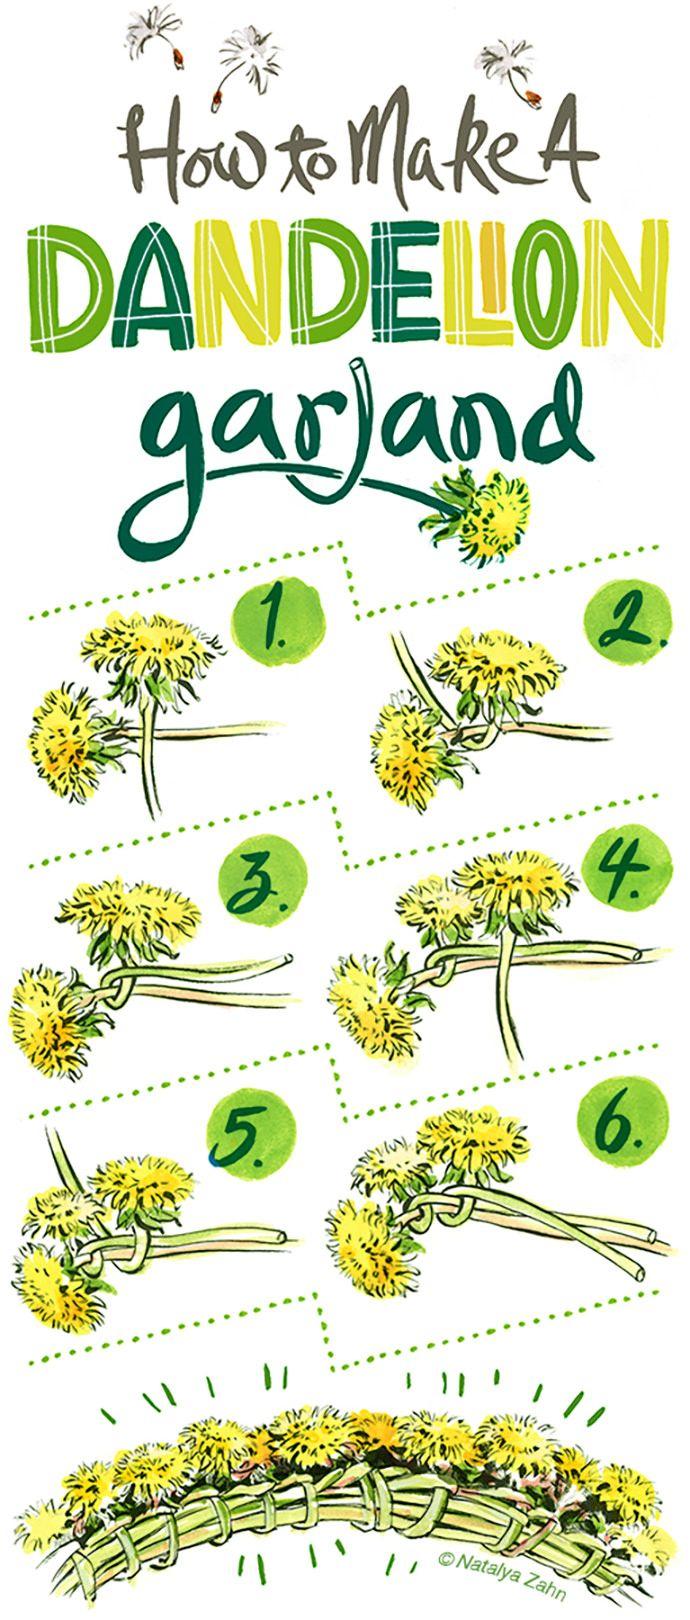 How to Make Dandelion Garland